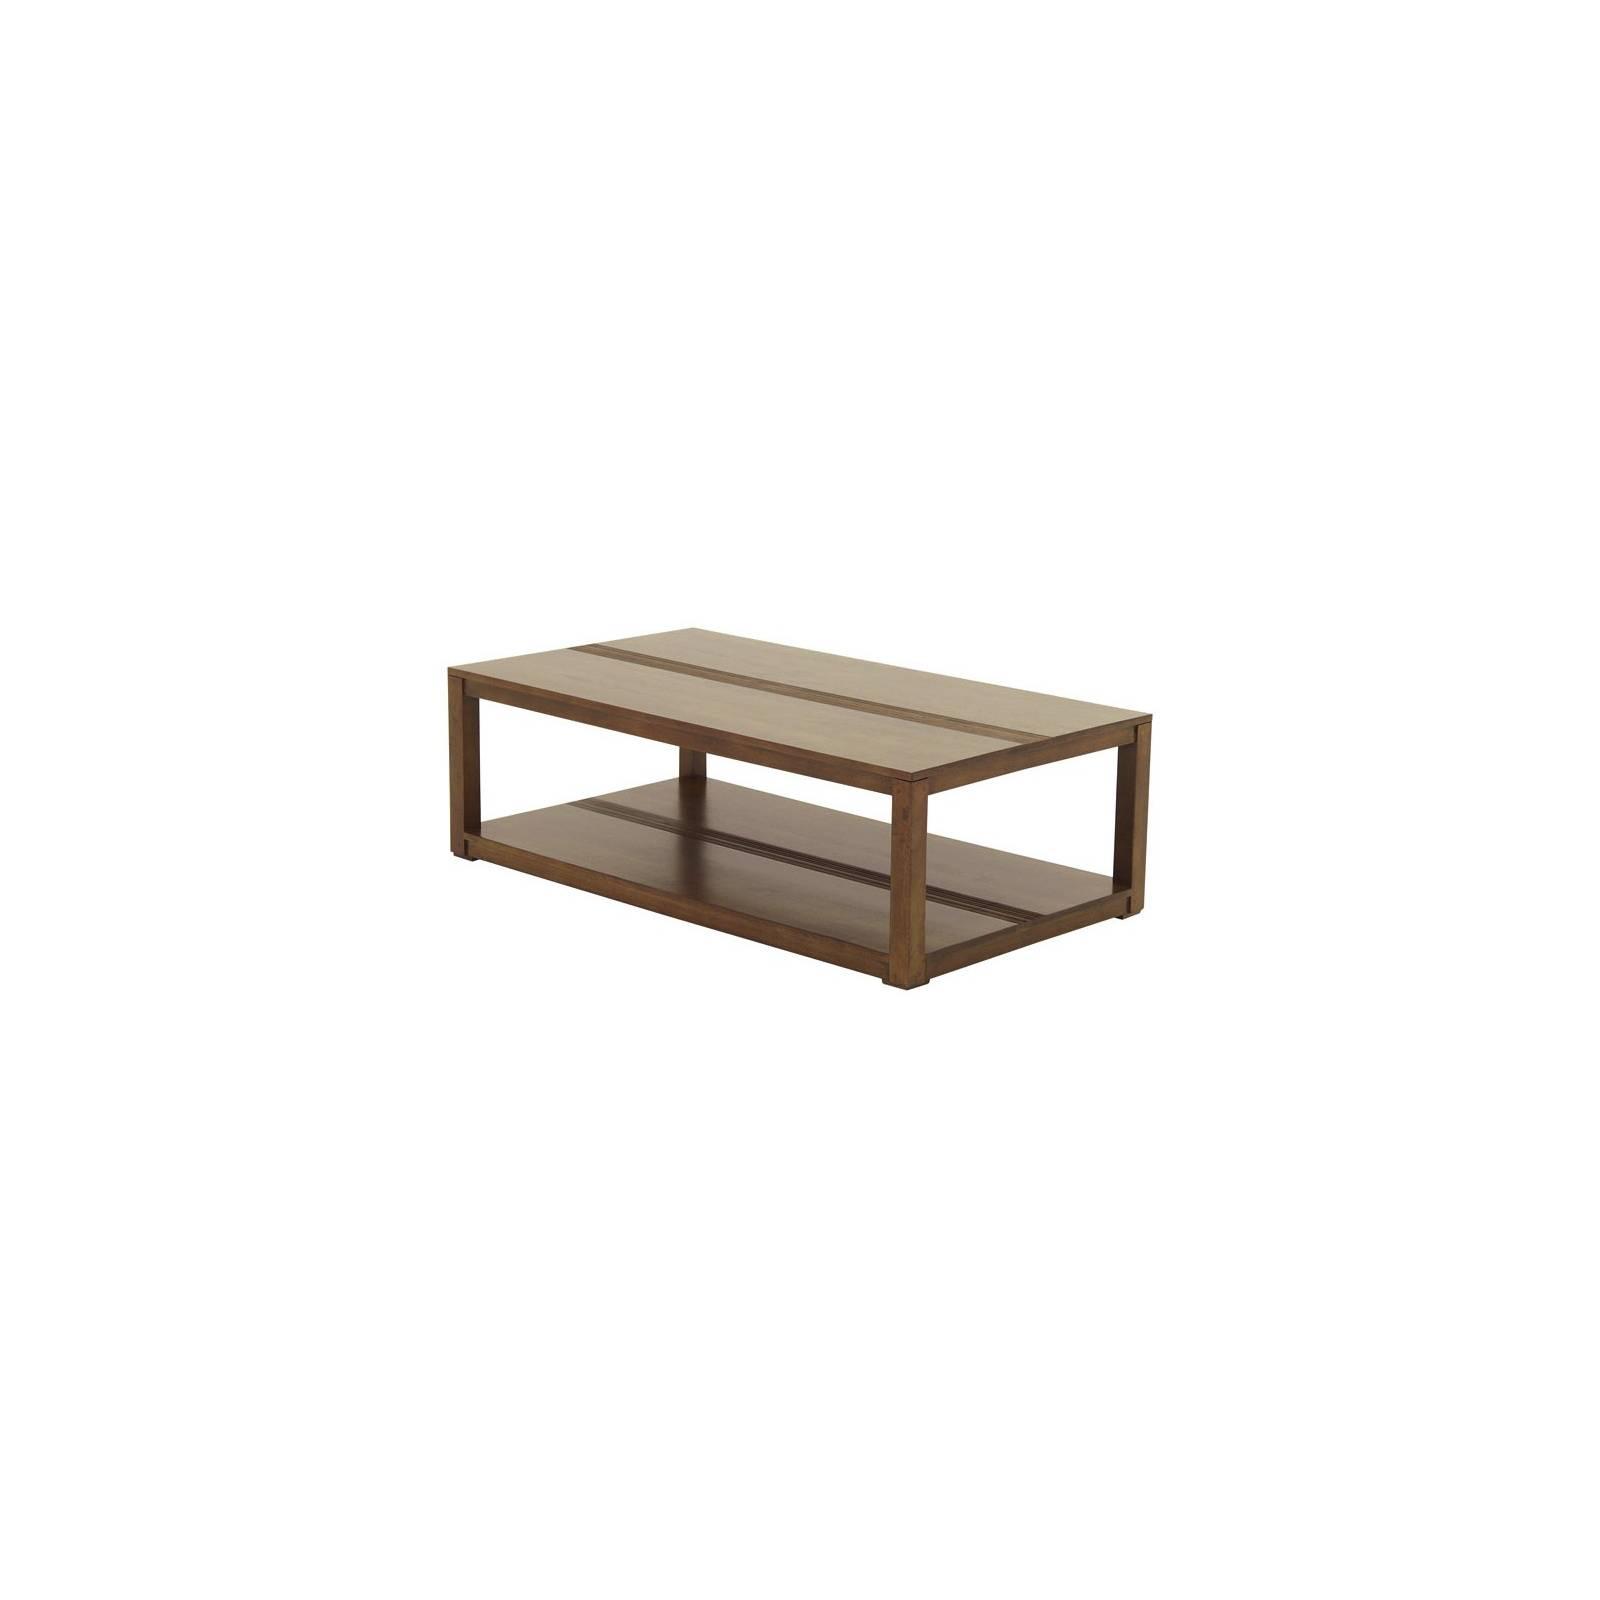 Table Basse Rectangulaire Siguiri Hévéa - meuble colonial